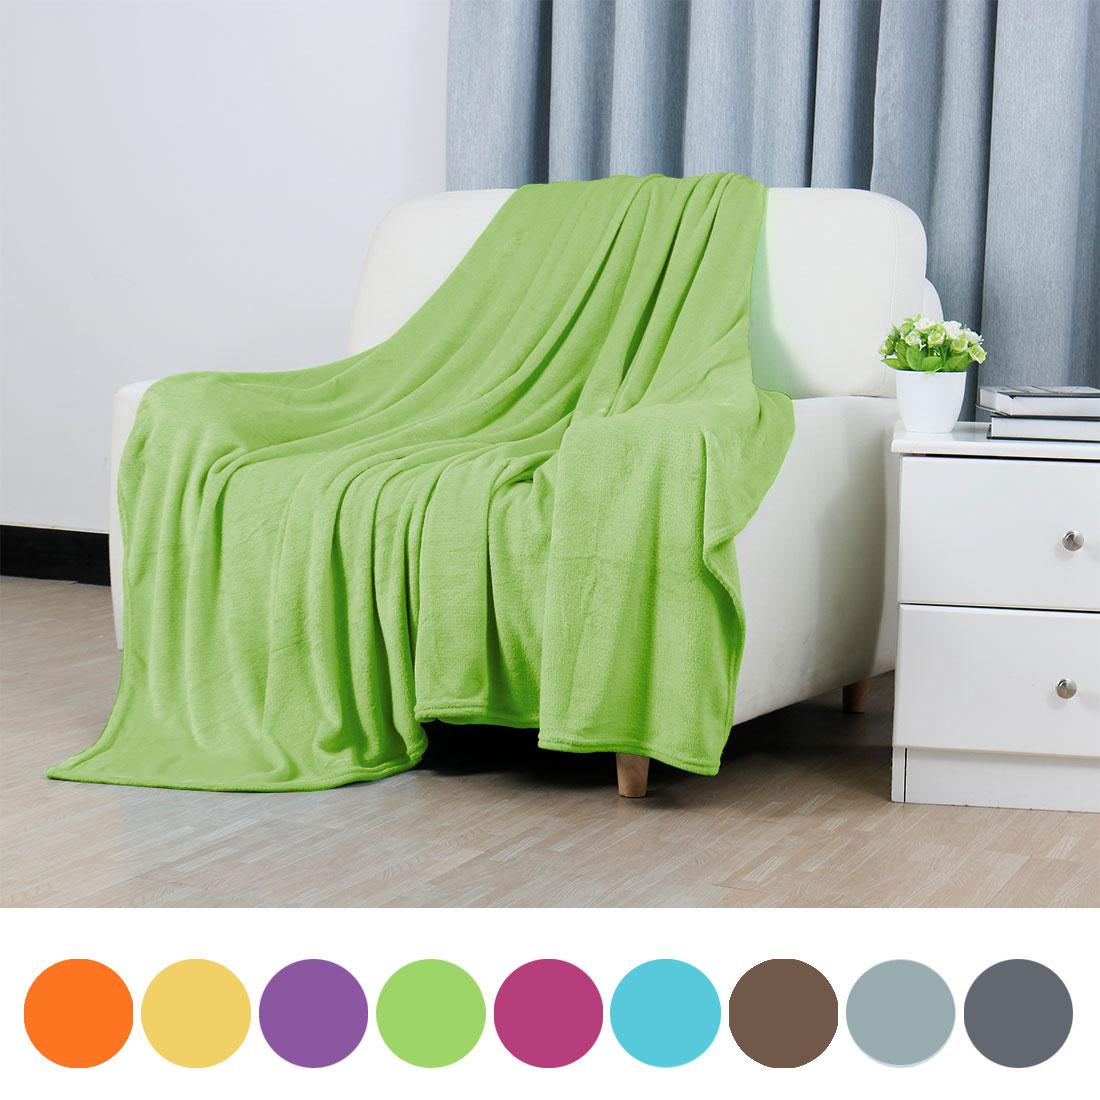 Soft Warm Fleece Blanket Throw Rug Plain Plush Flannel Blanket Queen Camel Color